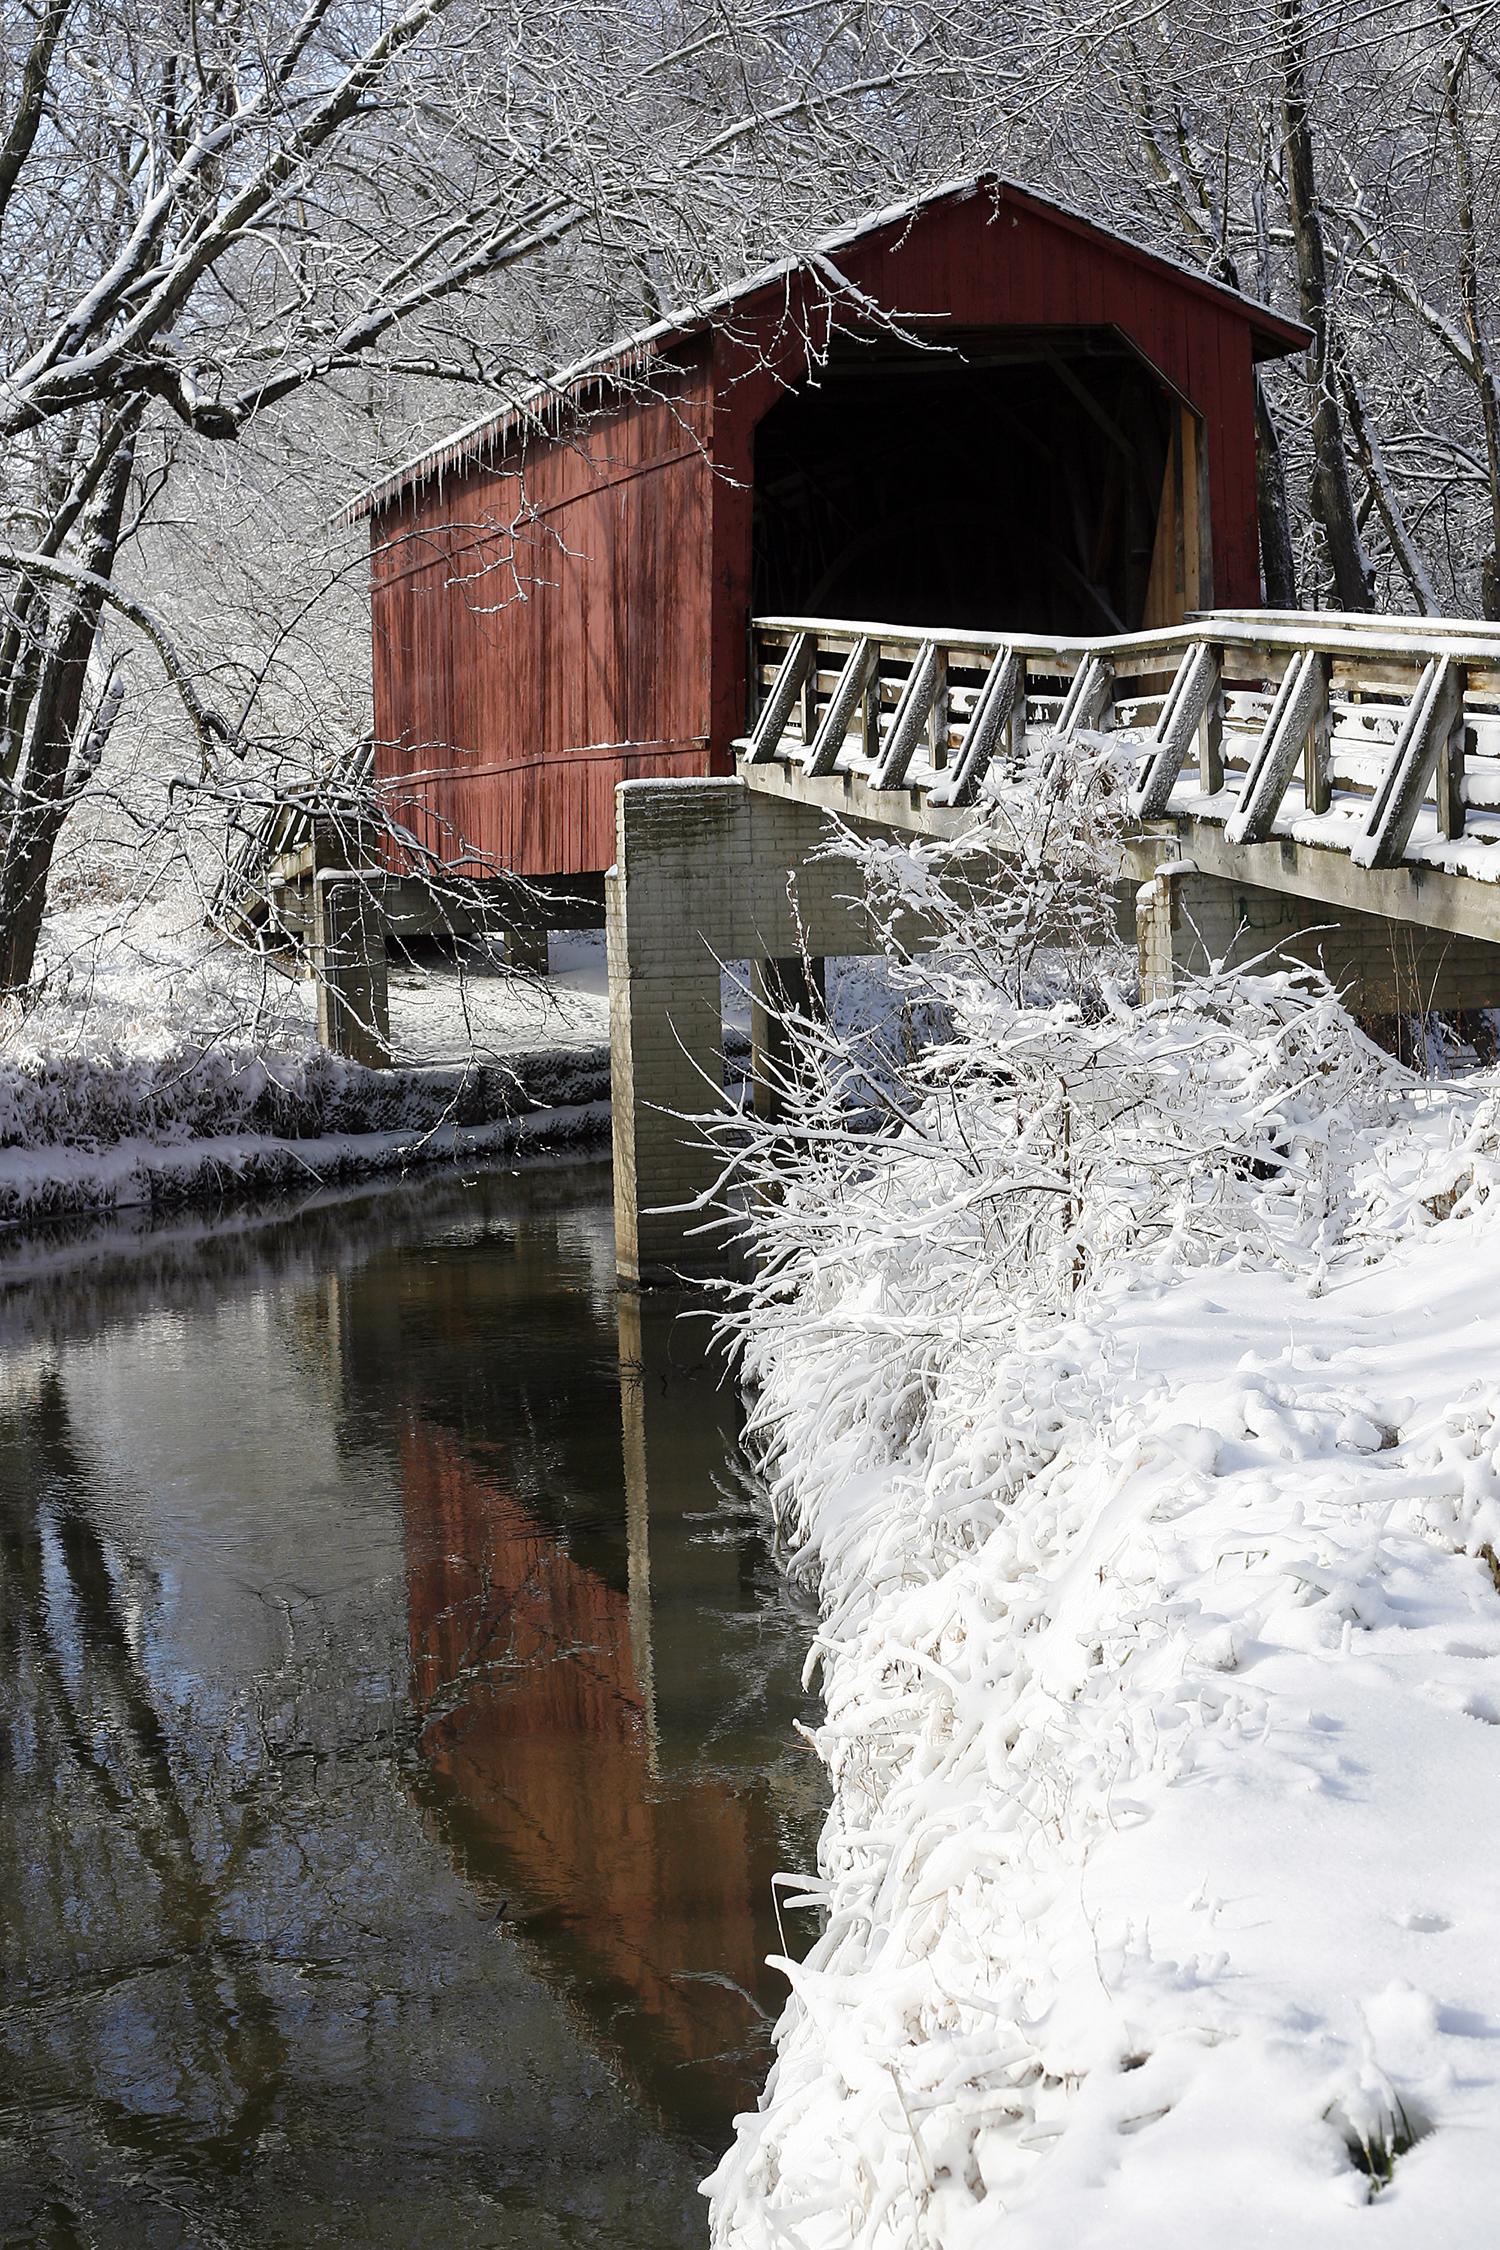 Pristine snow surrounds Sugar Creek Covered Bridge near Chatham. Kendra Helmer/The State Journal-Register